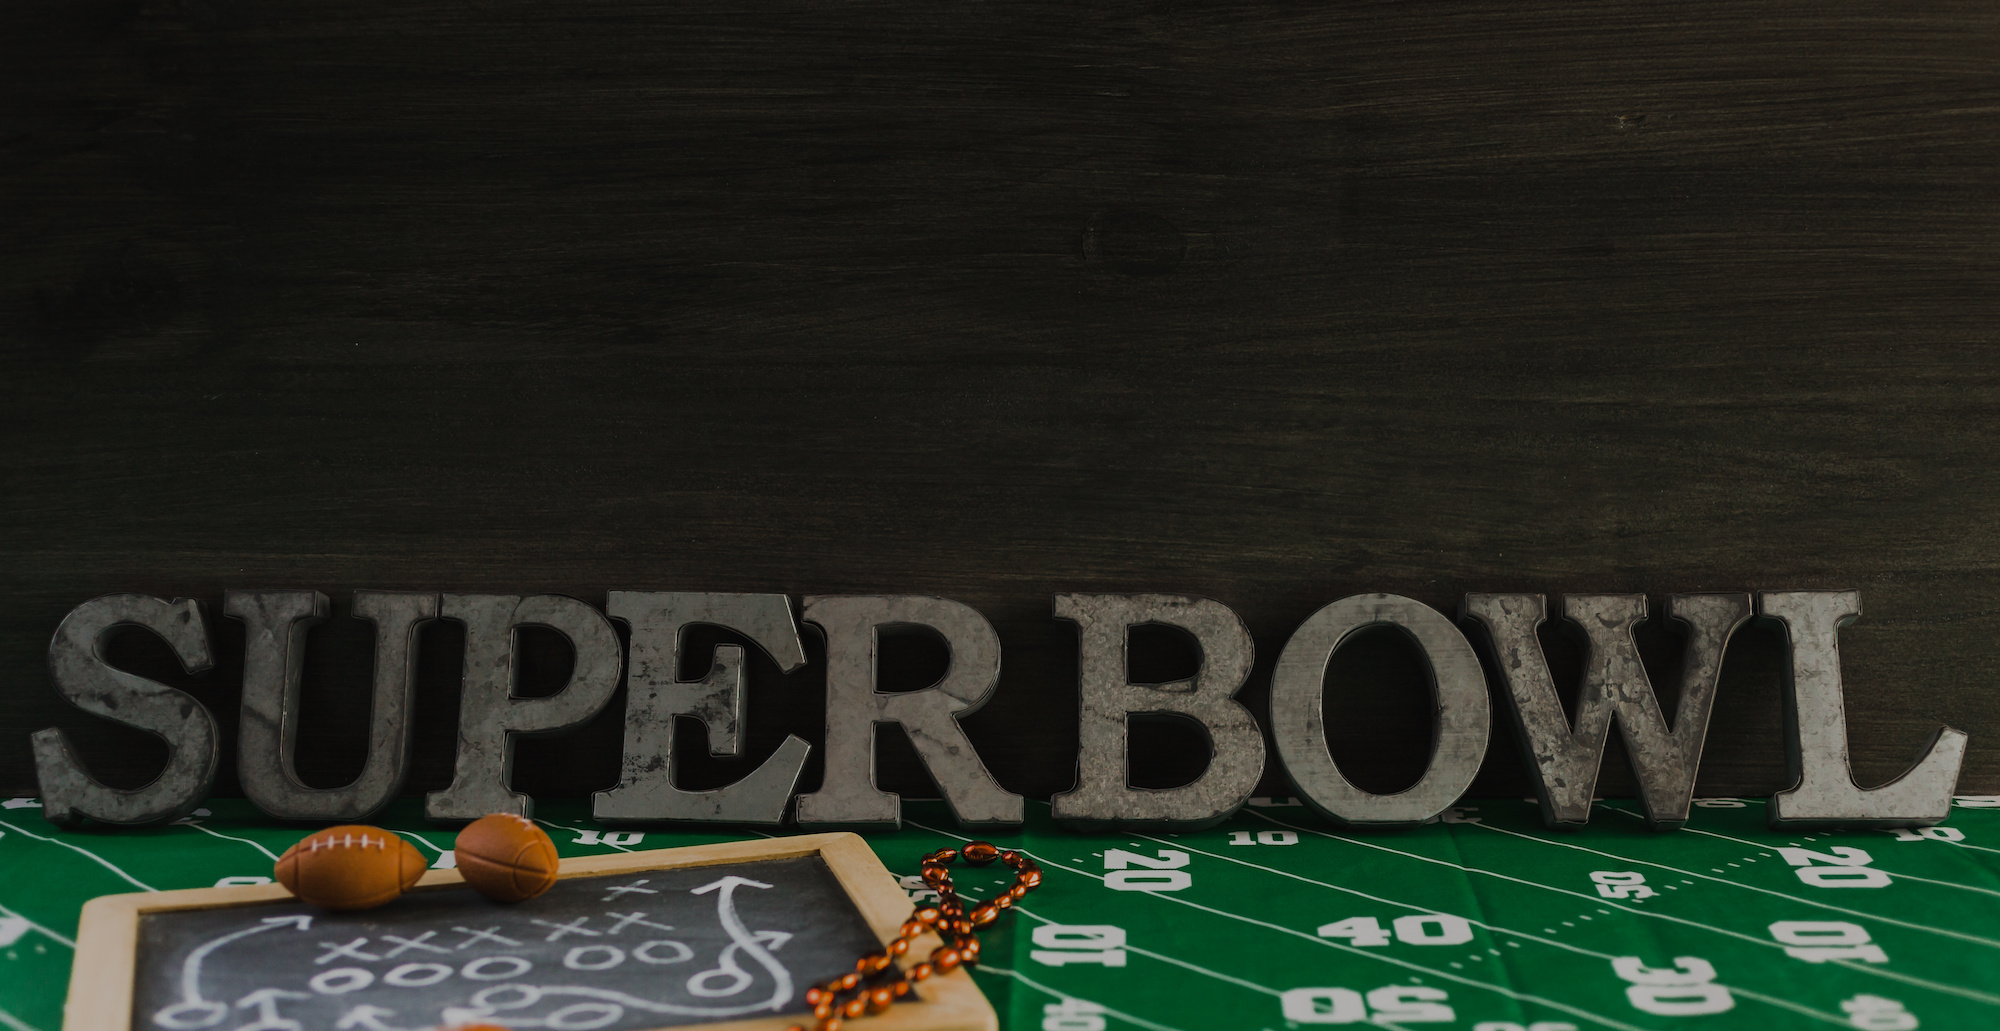 Super Bowl Wild Game Recipes